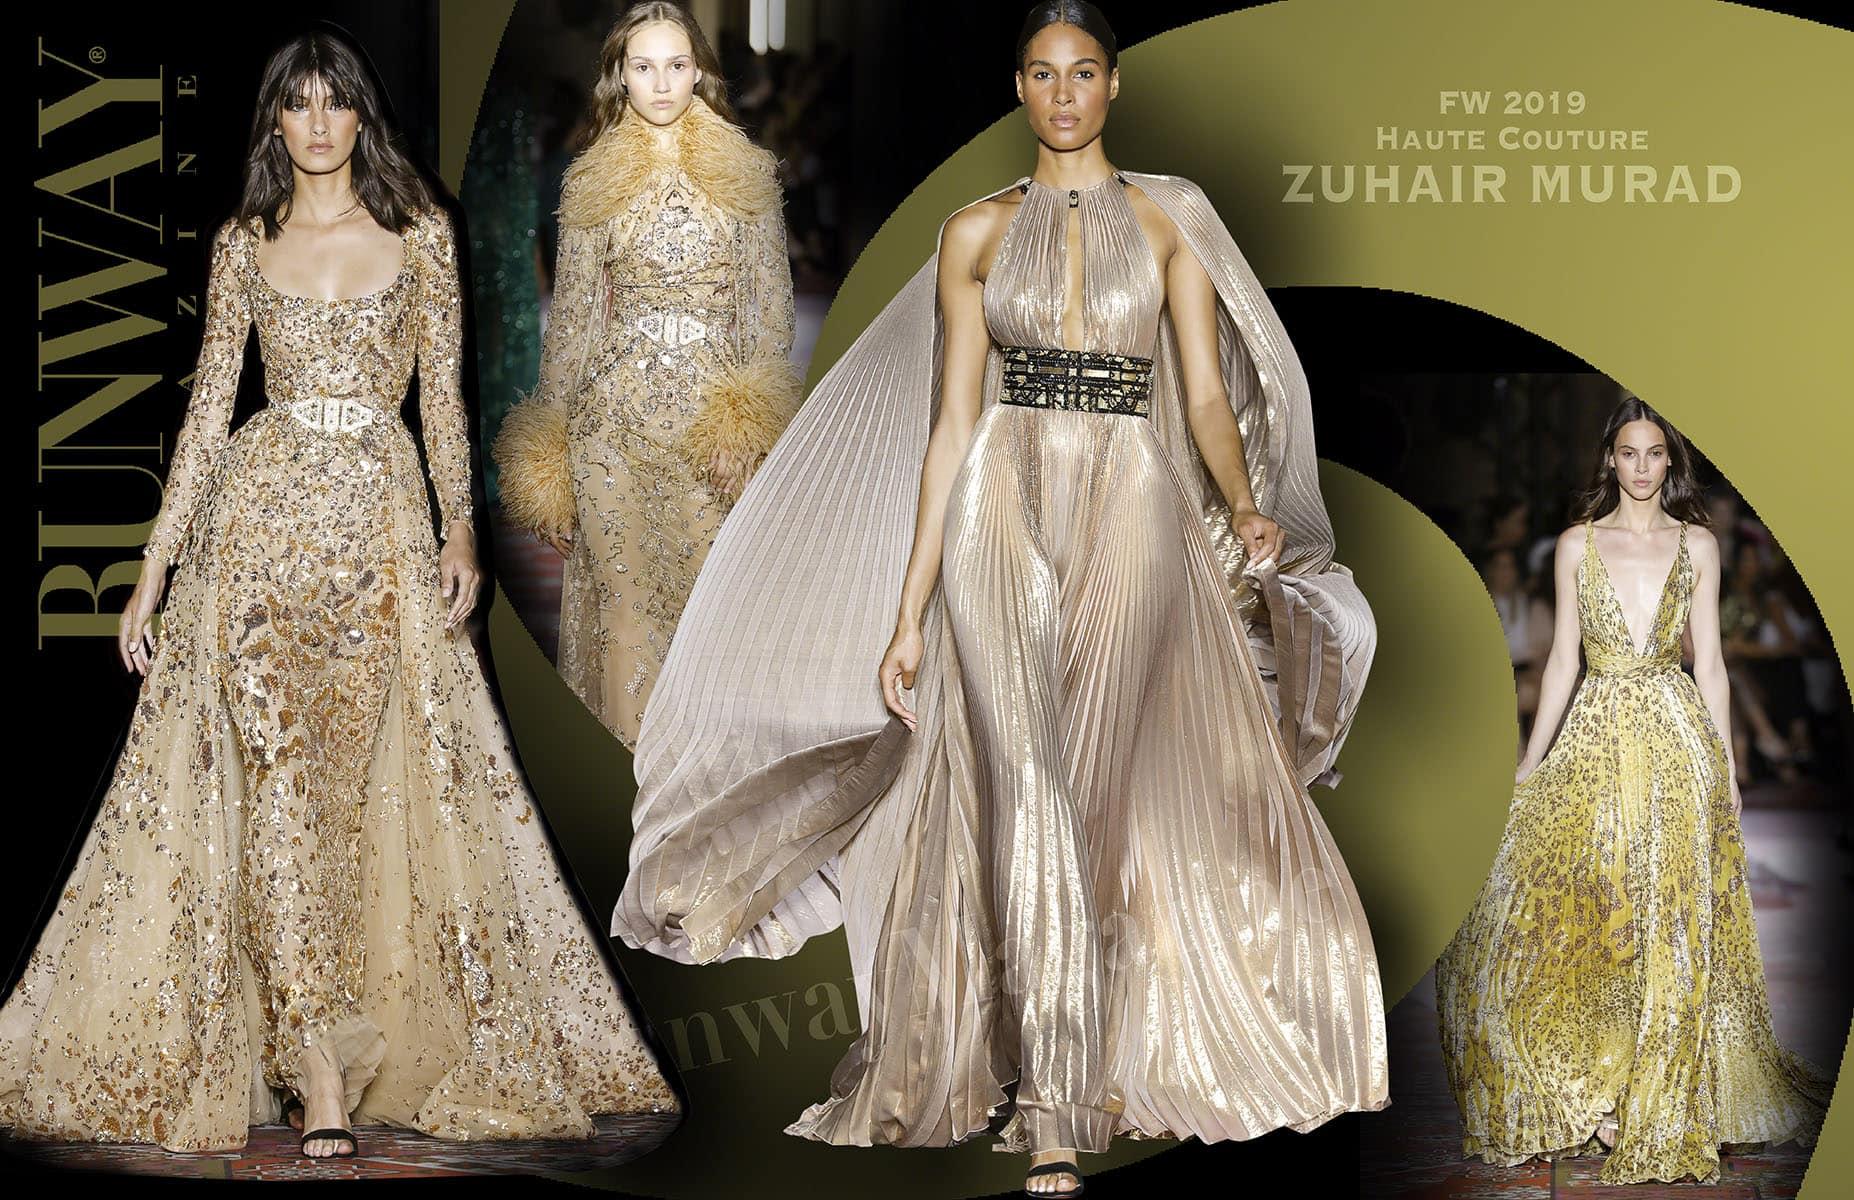 Zuhair Murad Haute Couture Fall-Winter 2019-2020 Paris Fashion Week by RUNWAY MAGAZINE